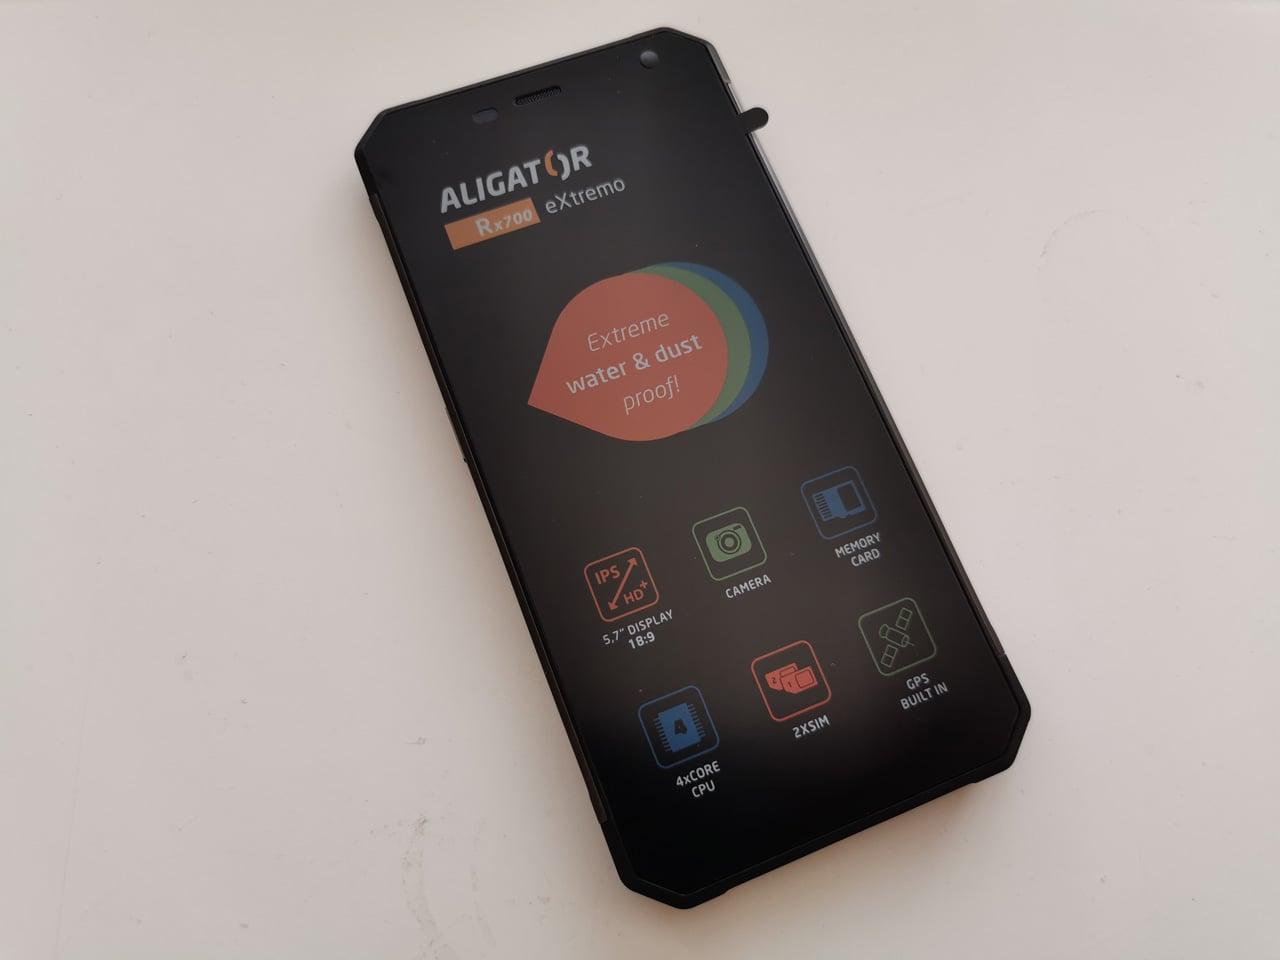 Český smartphone Aligator RX700 eXtremo